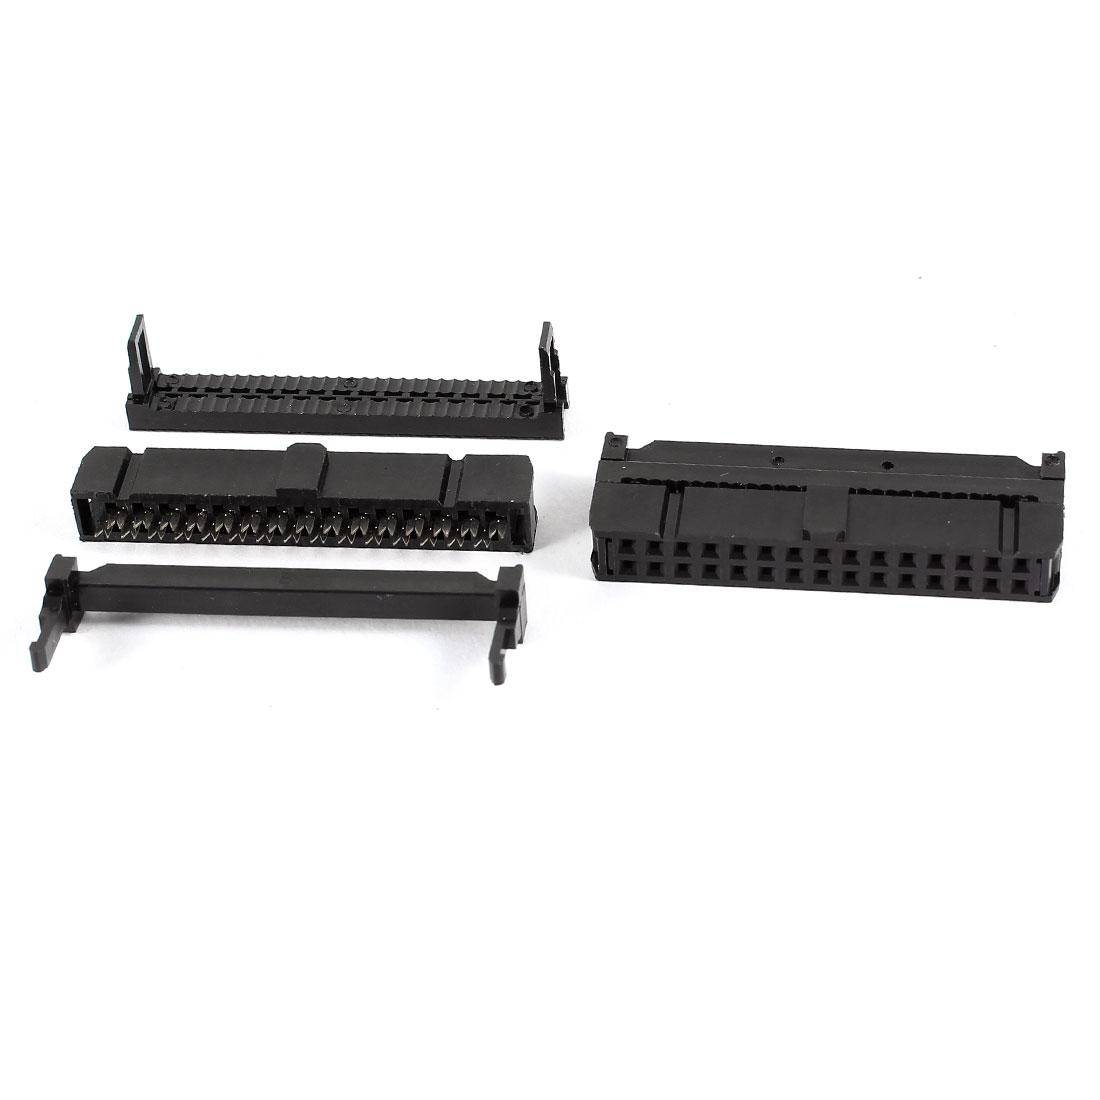 2 x Ribbon Cable FC-30P 30Pin 2.54mm Pitch ISP 3 in 1 Set JTAG Socket Connectors